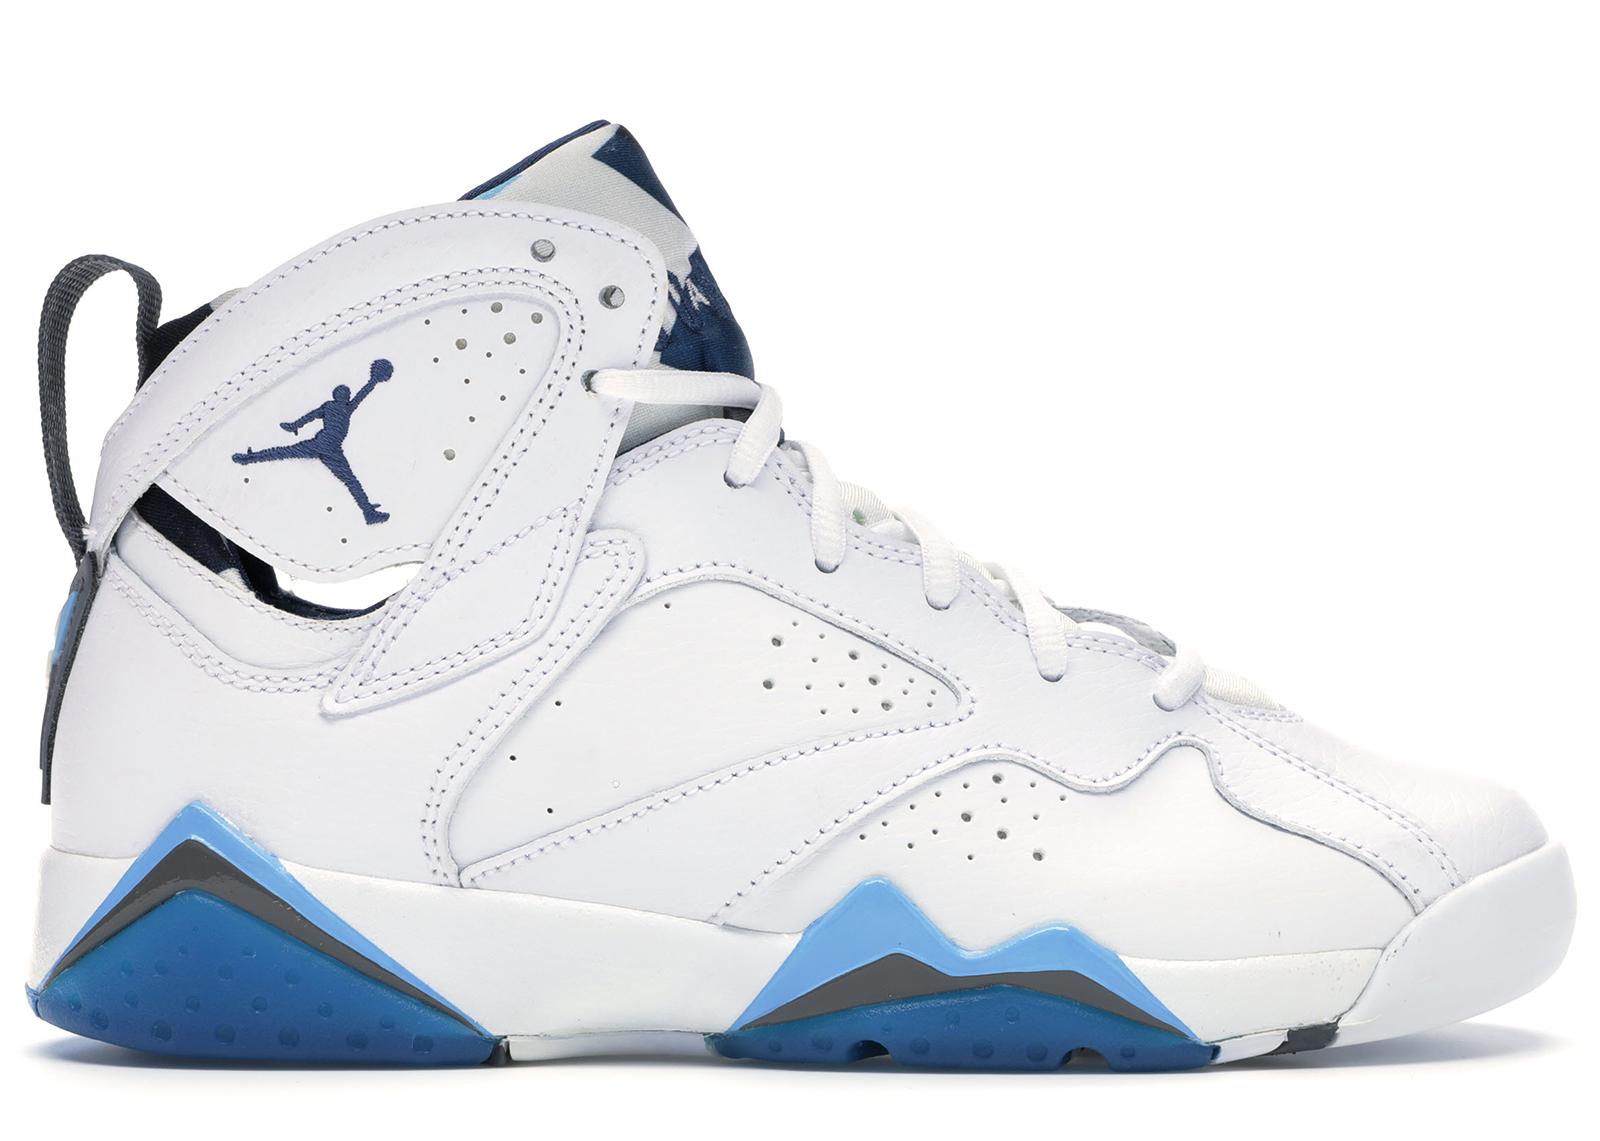 Jordan 7 Retro French Blue 2015 (GS